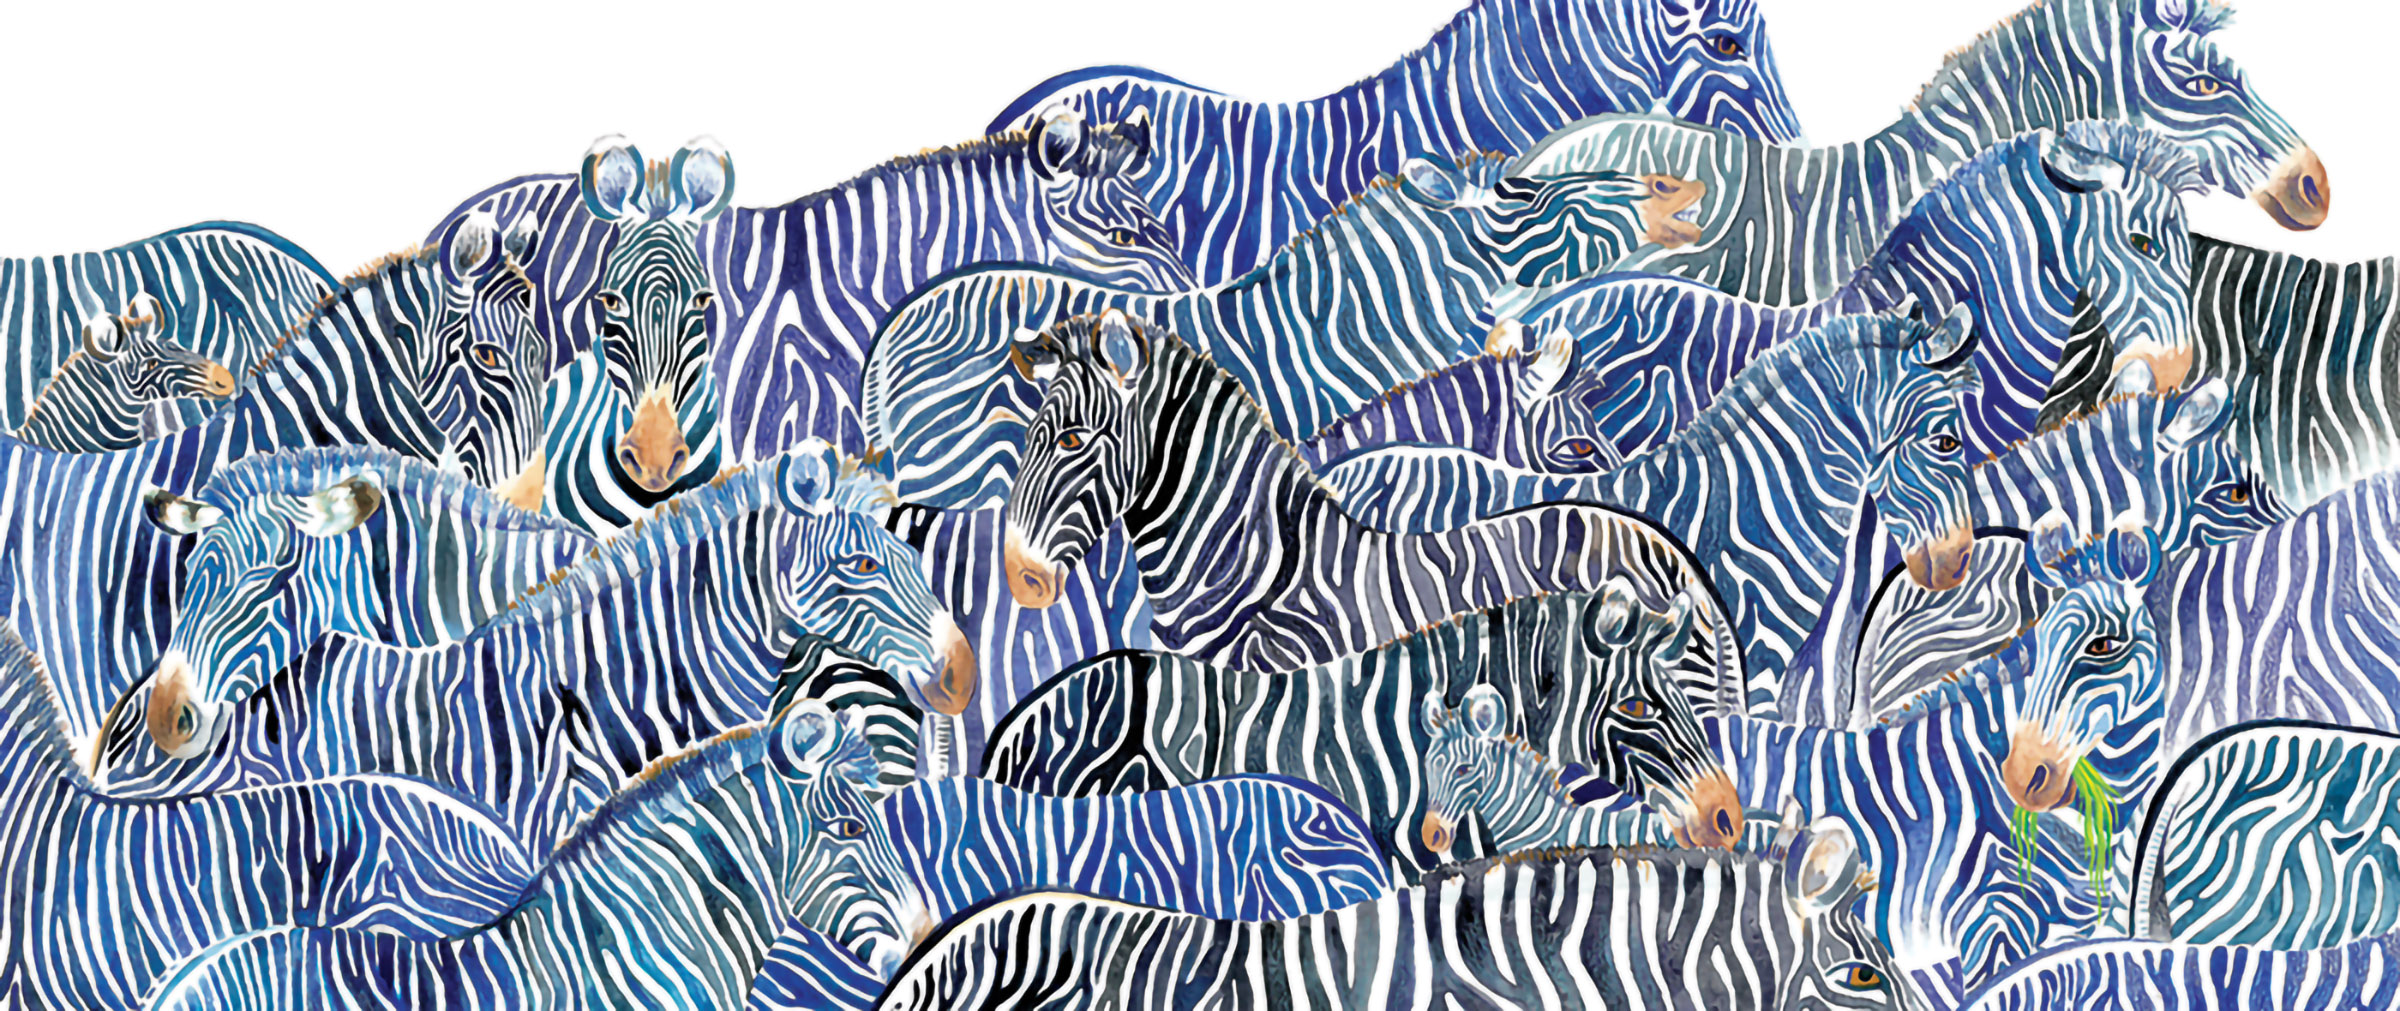 Zebras_web.jpg